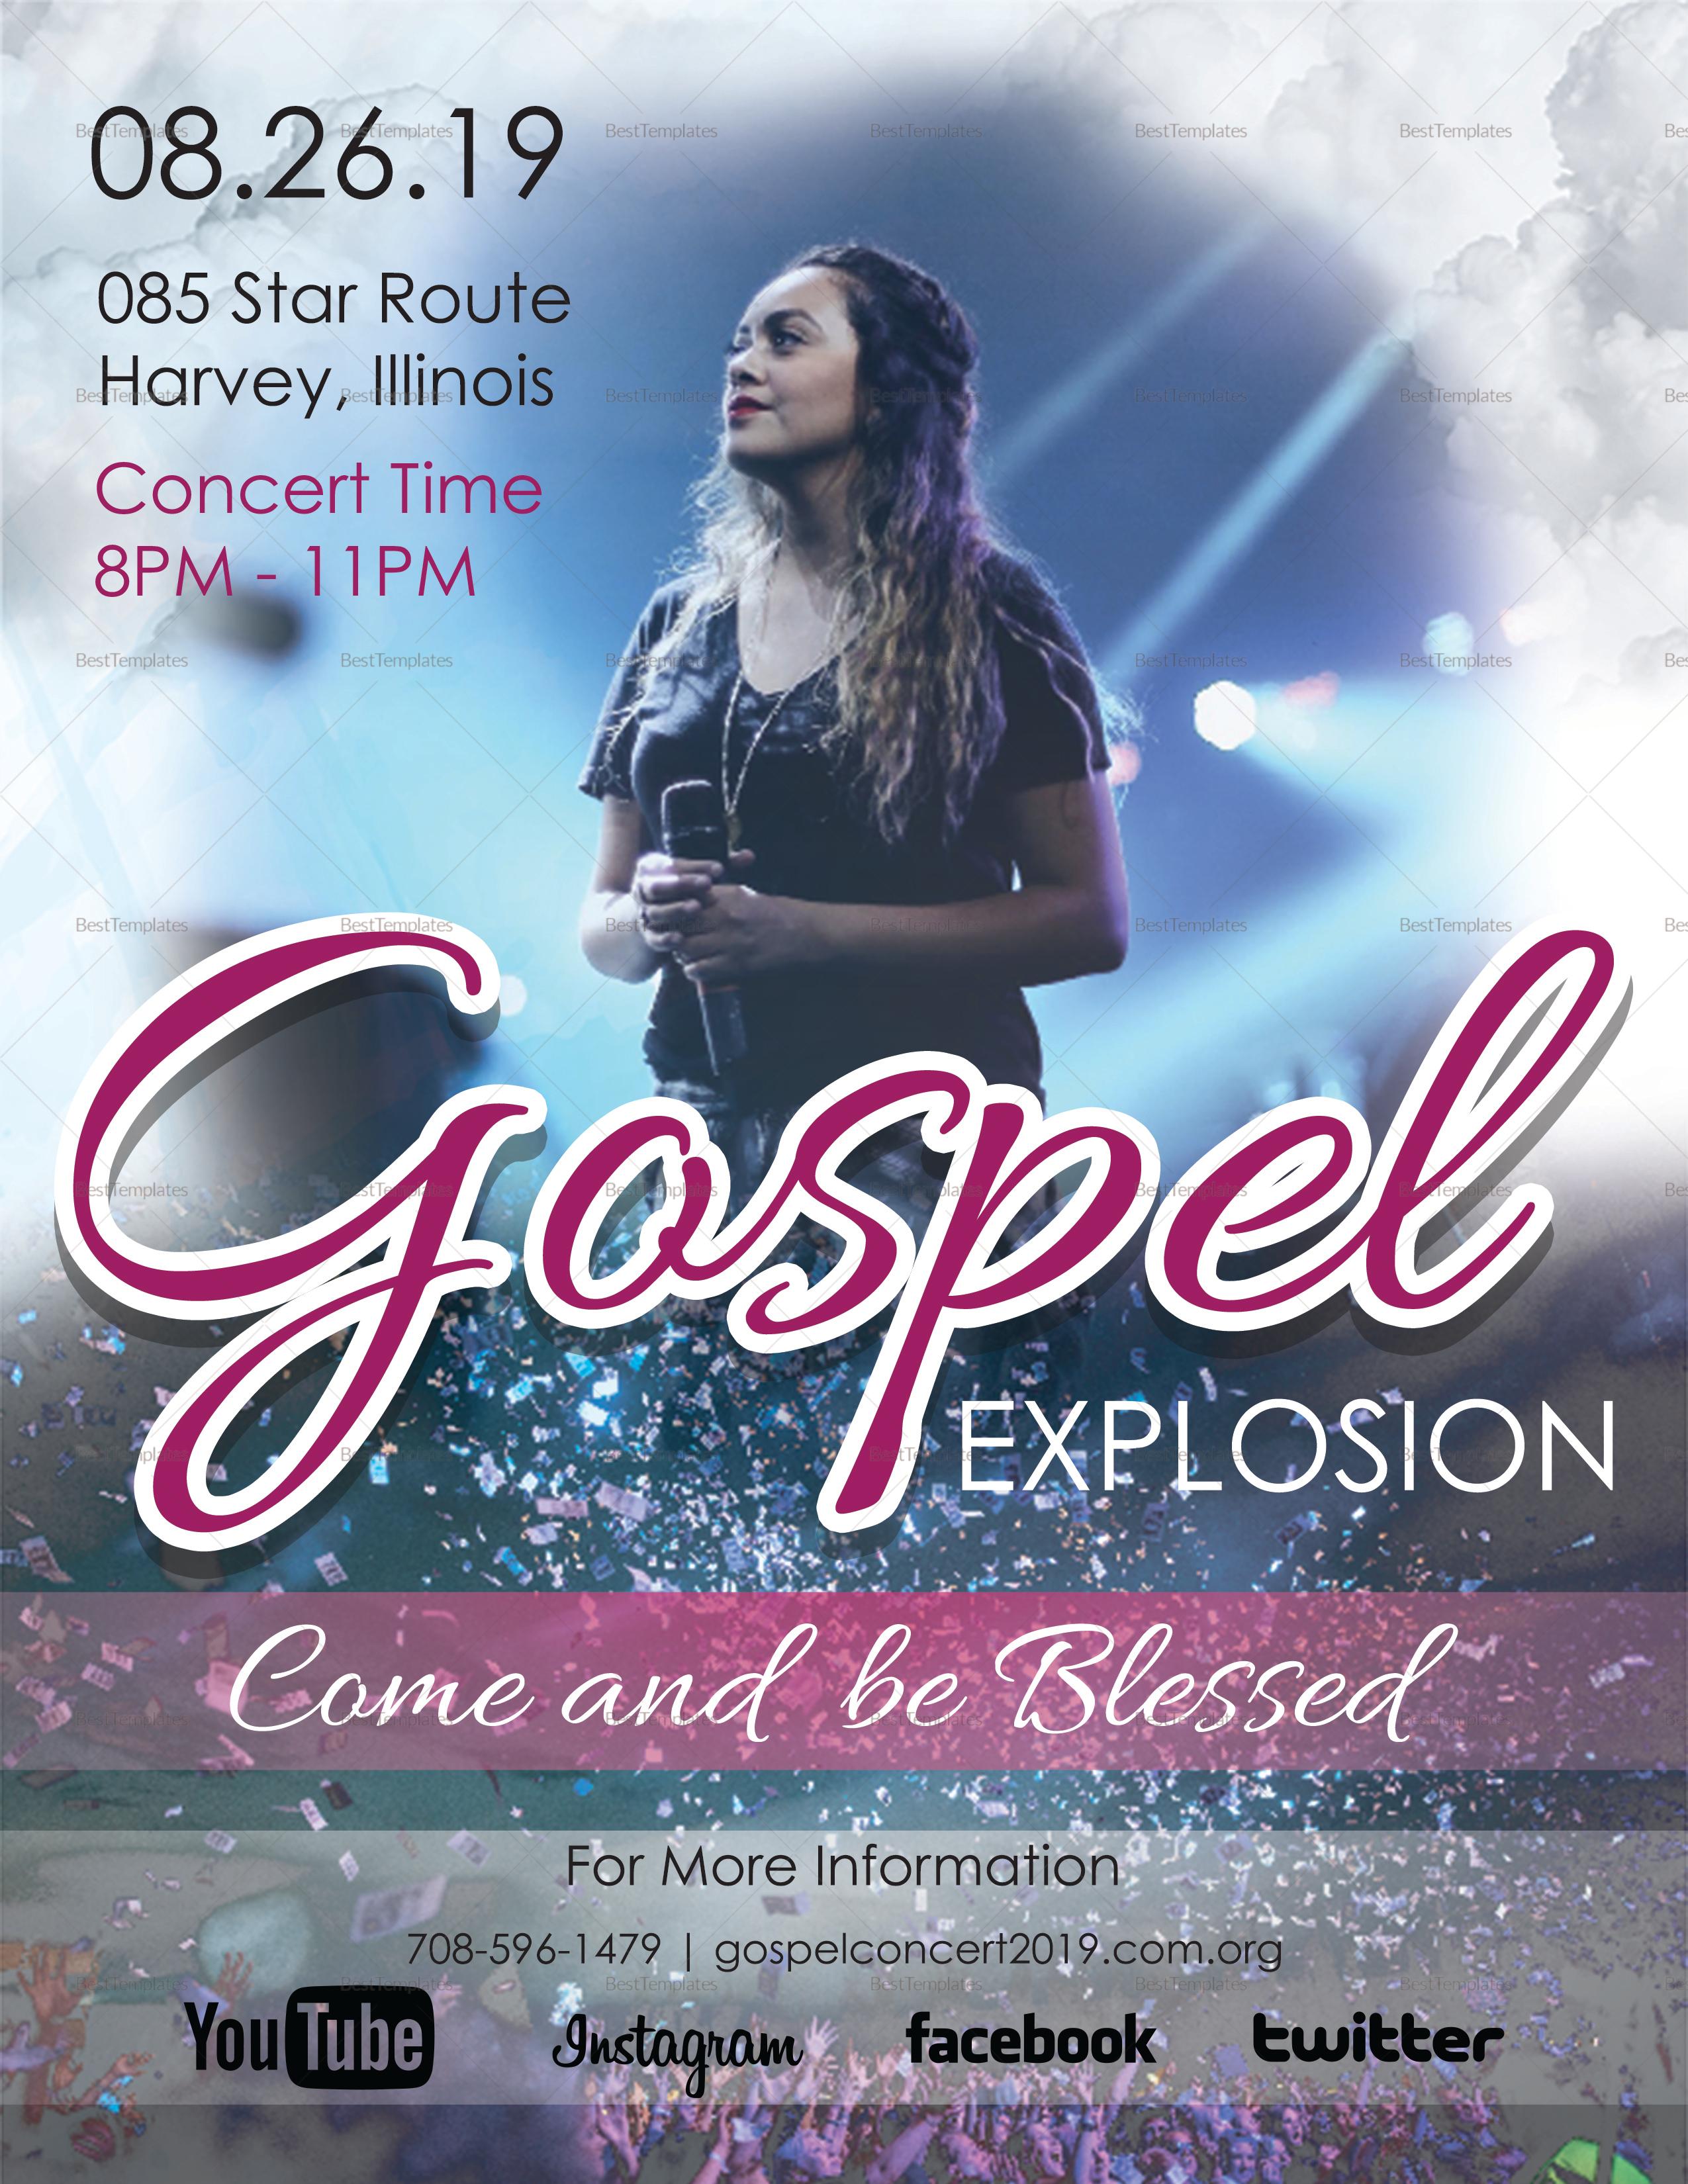 Gospel Explosion Flyer Design Template In Psd Word Publisher